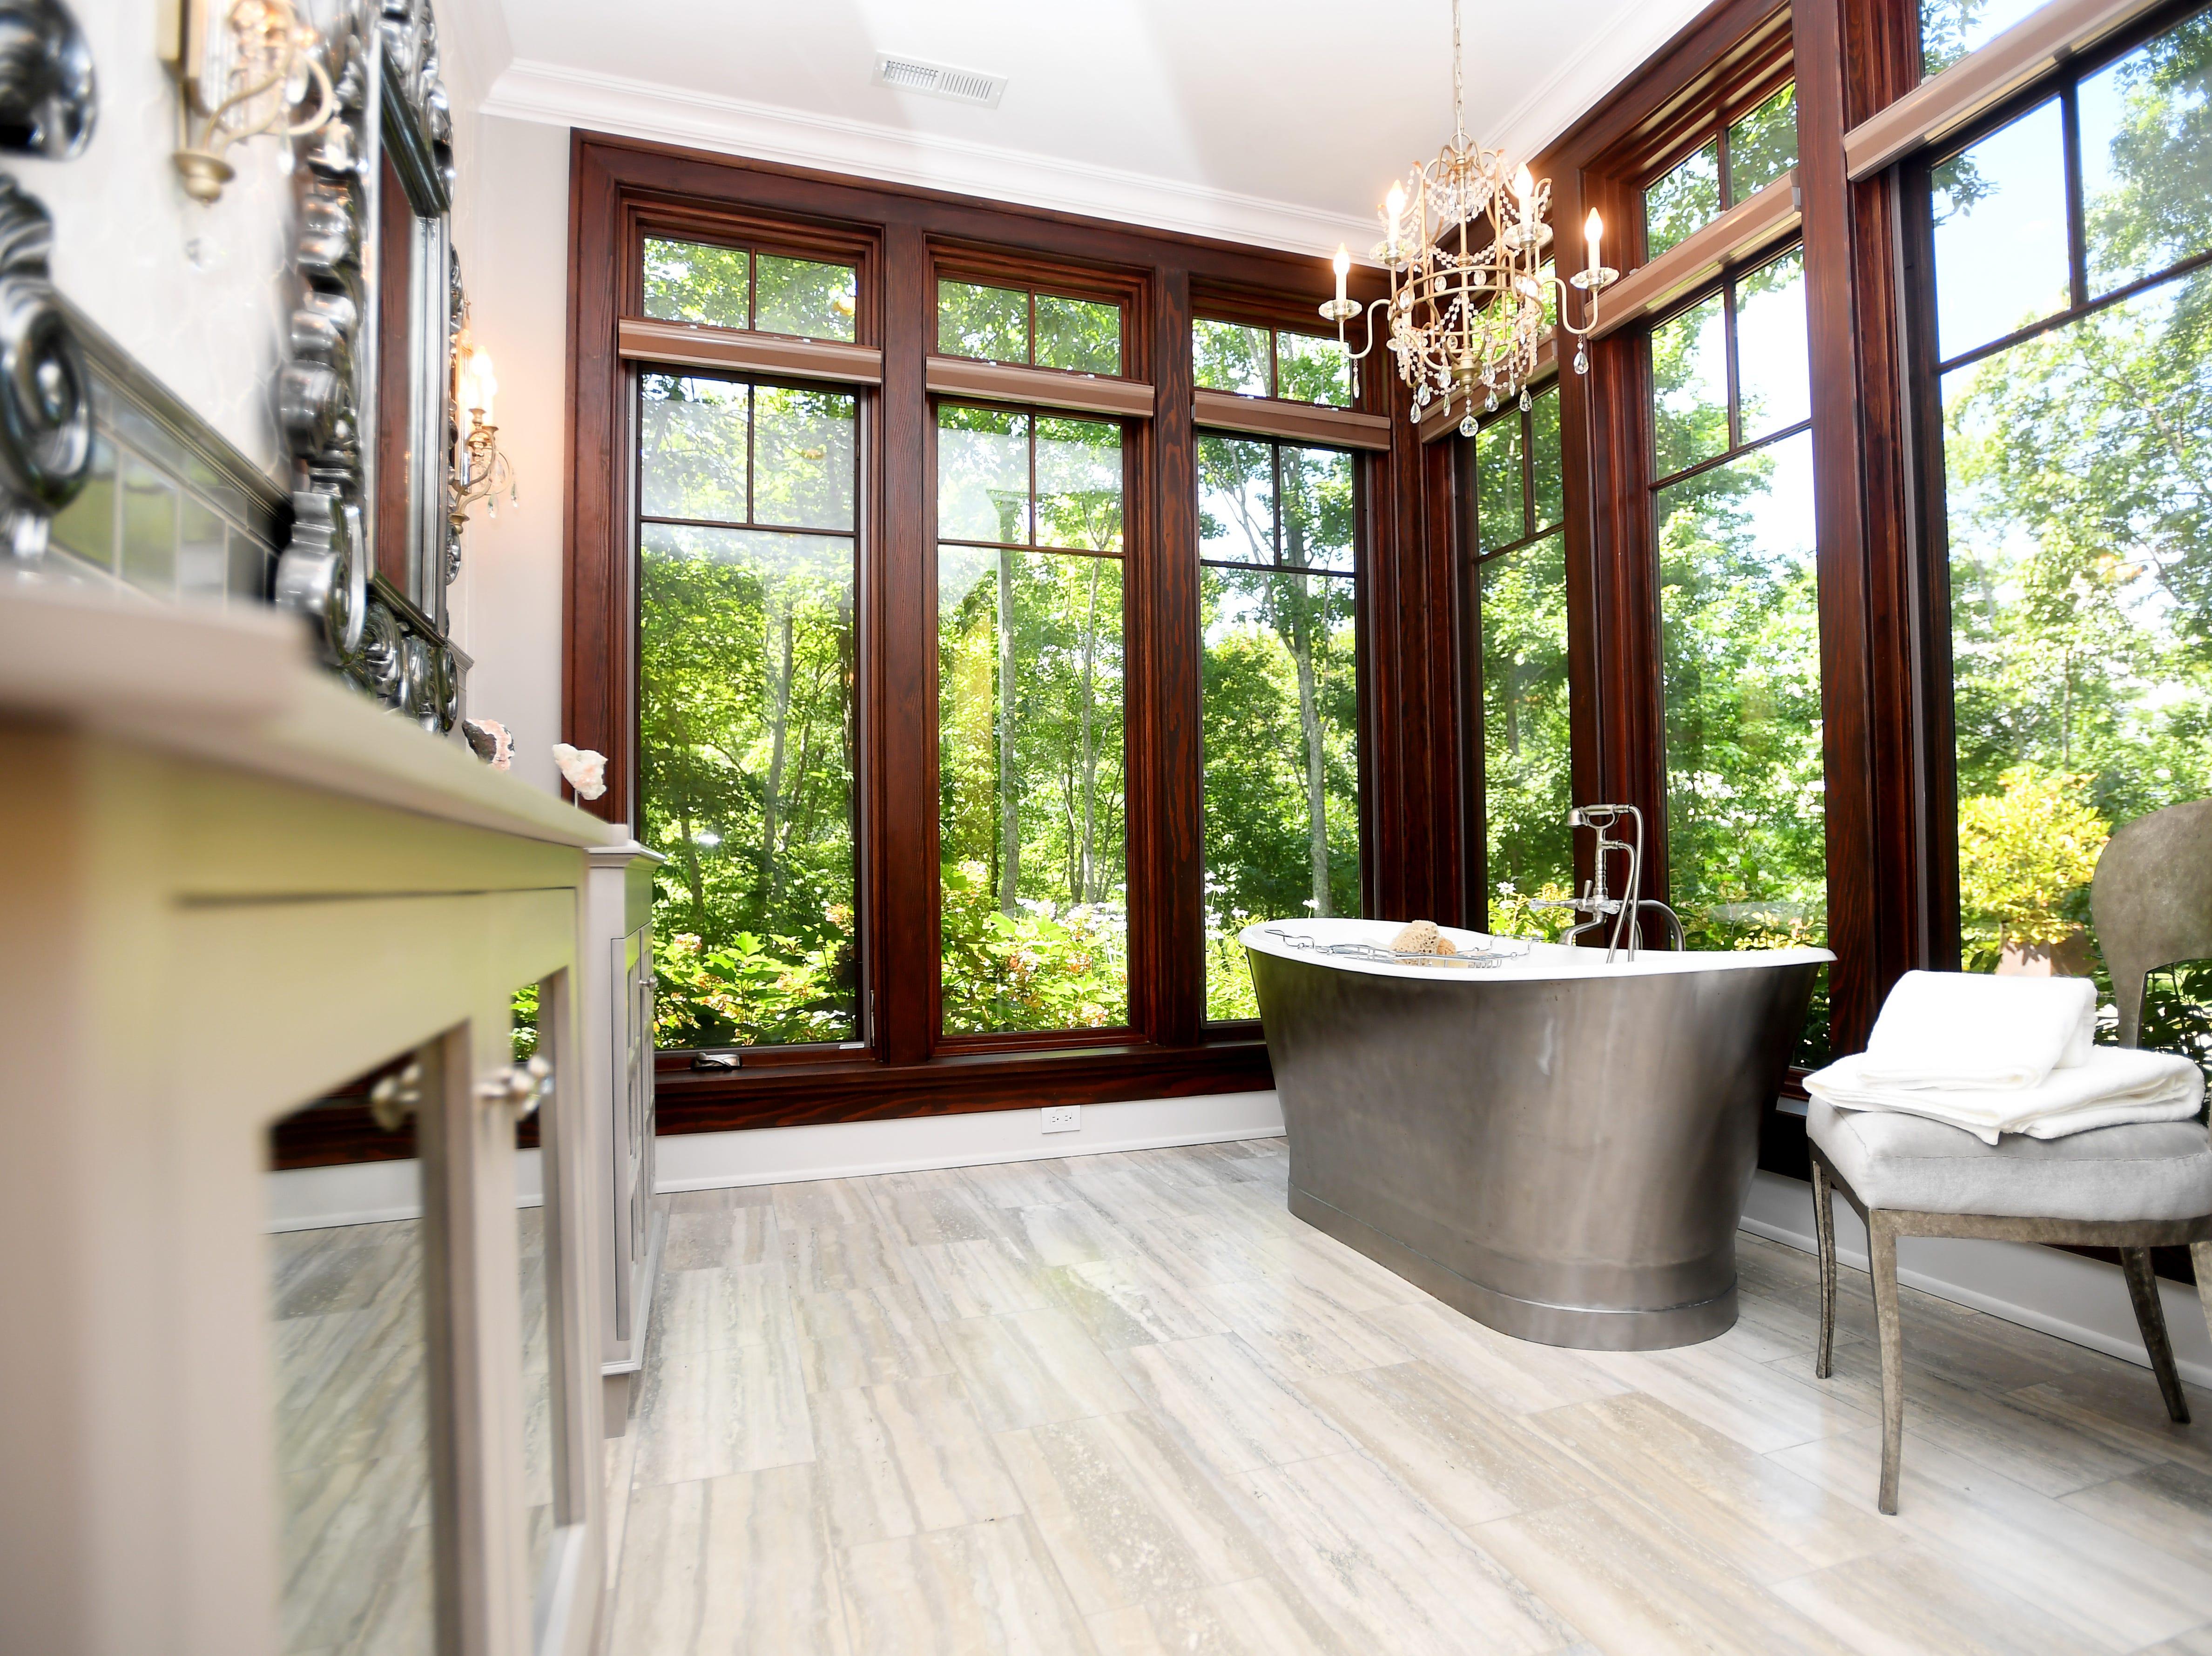 A bathroom on the basement floor of Bobbye and Ken Bowdon's Balsam Mountain Preserve home.